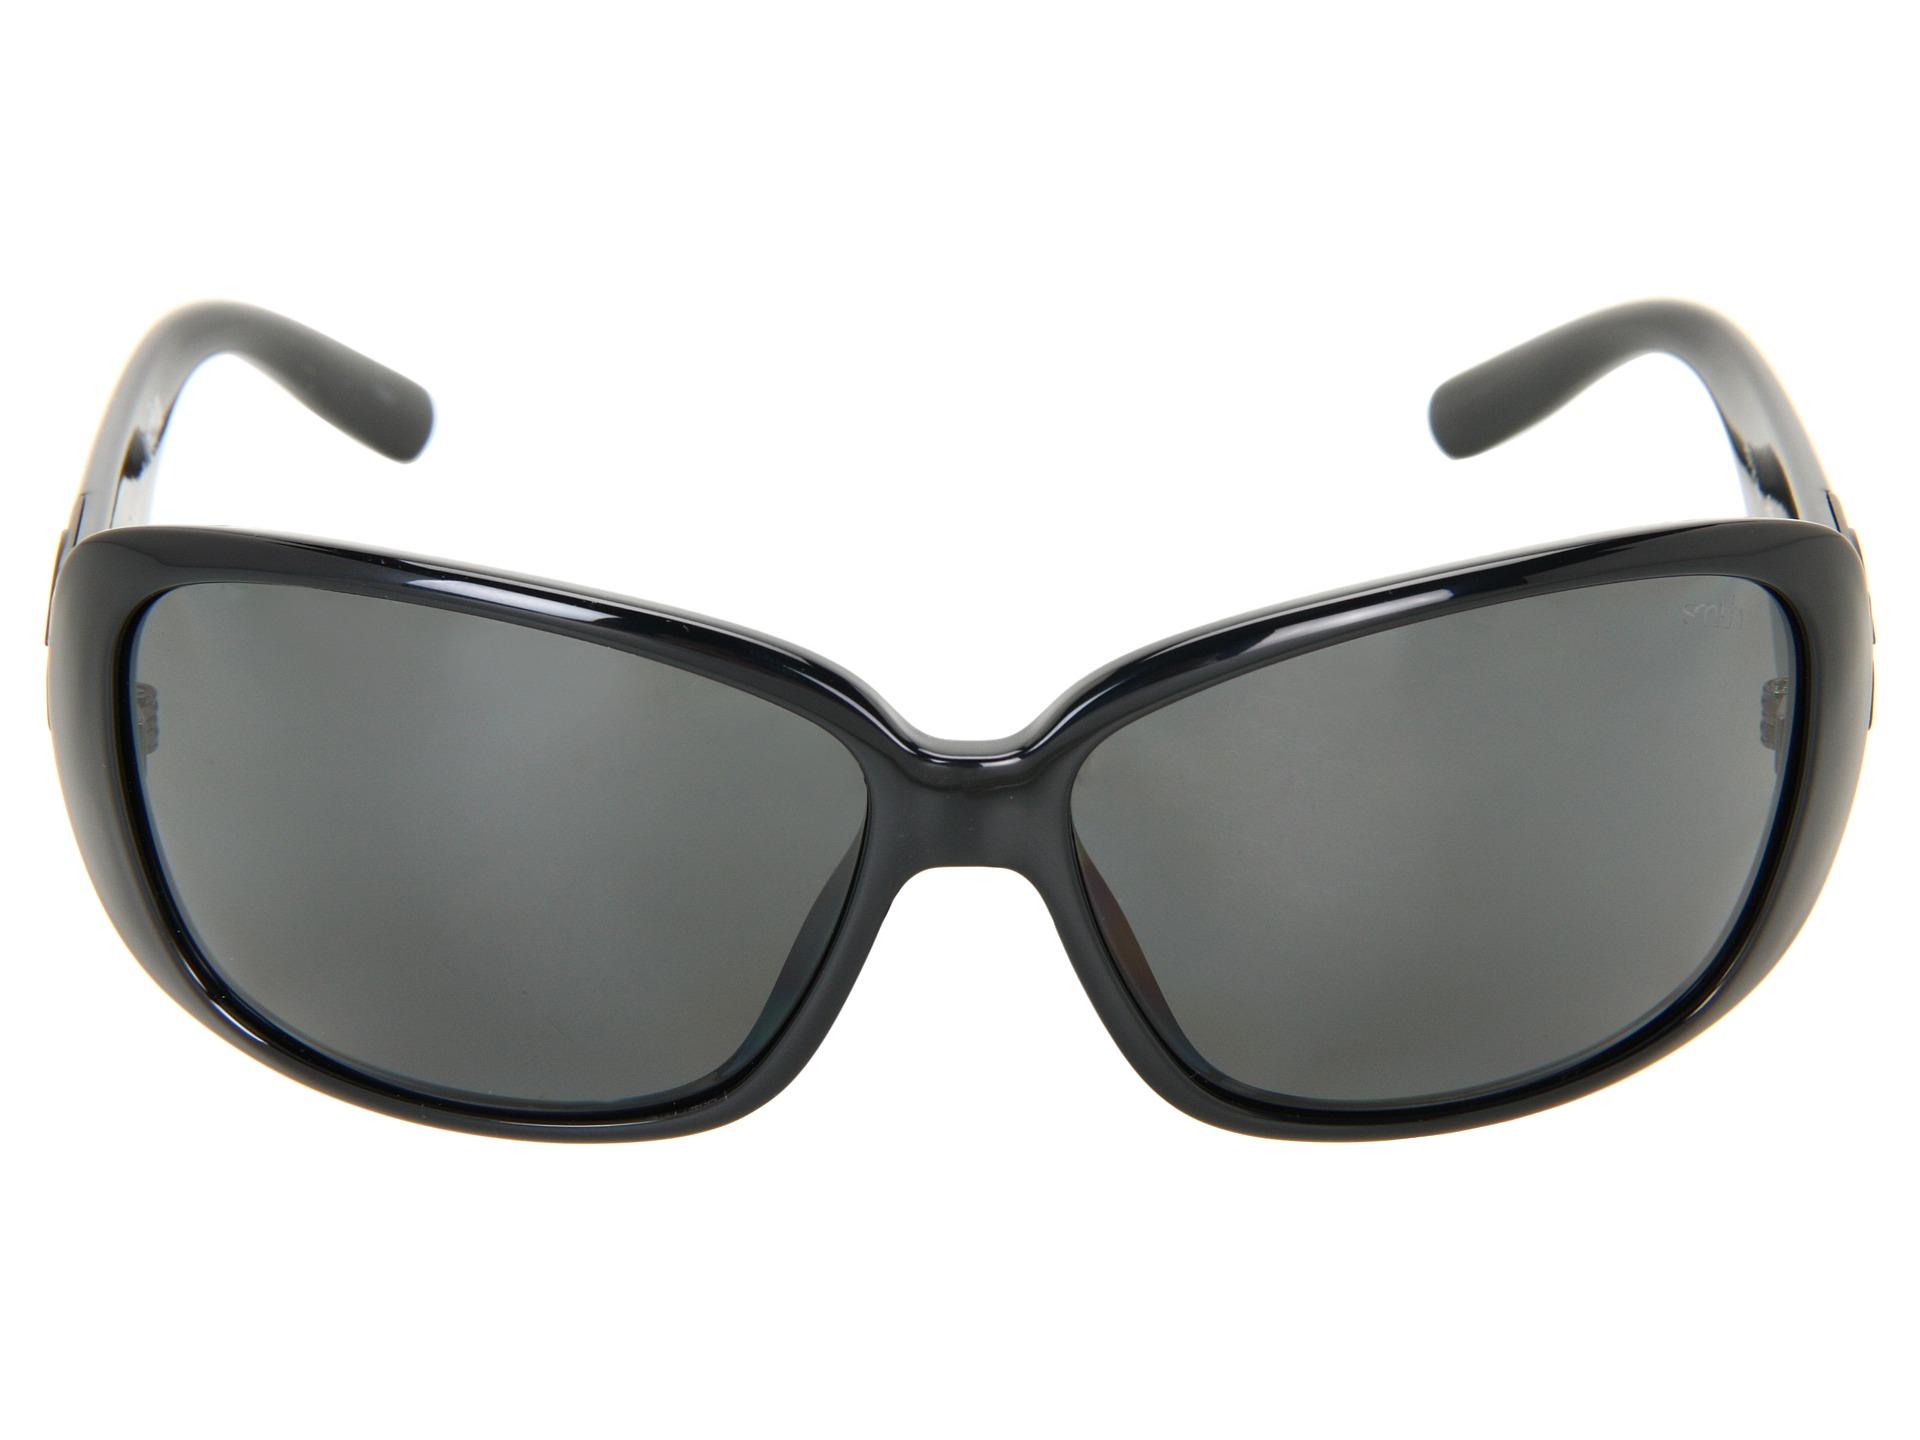 e63c661ab8c40 Lyst - Smith Optics Shorewood Polarized in Black